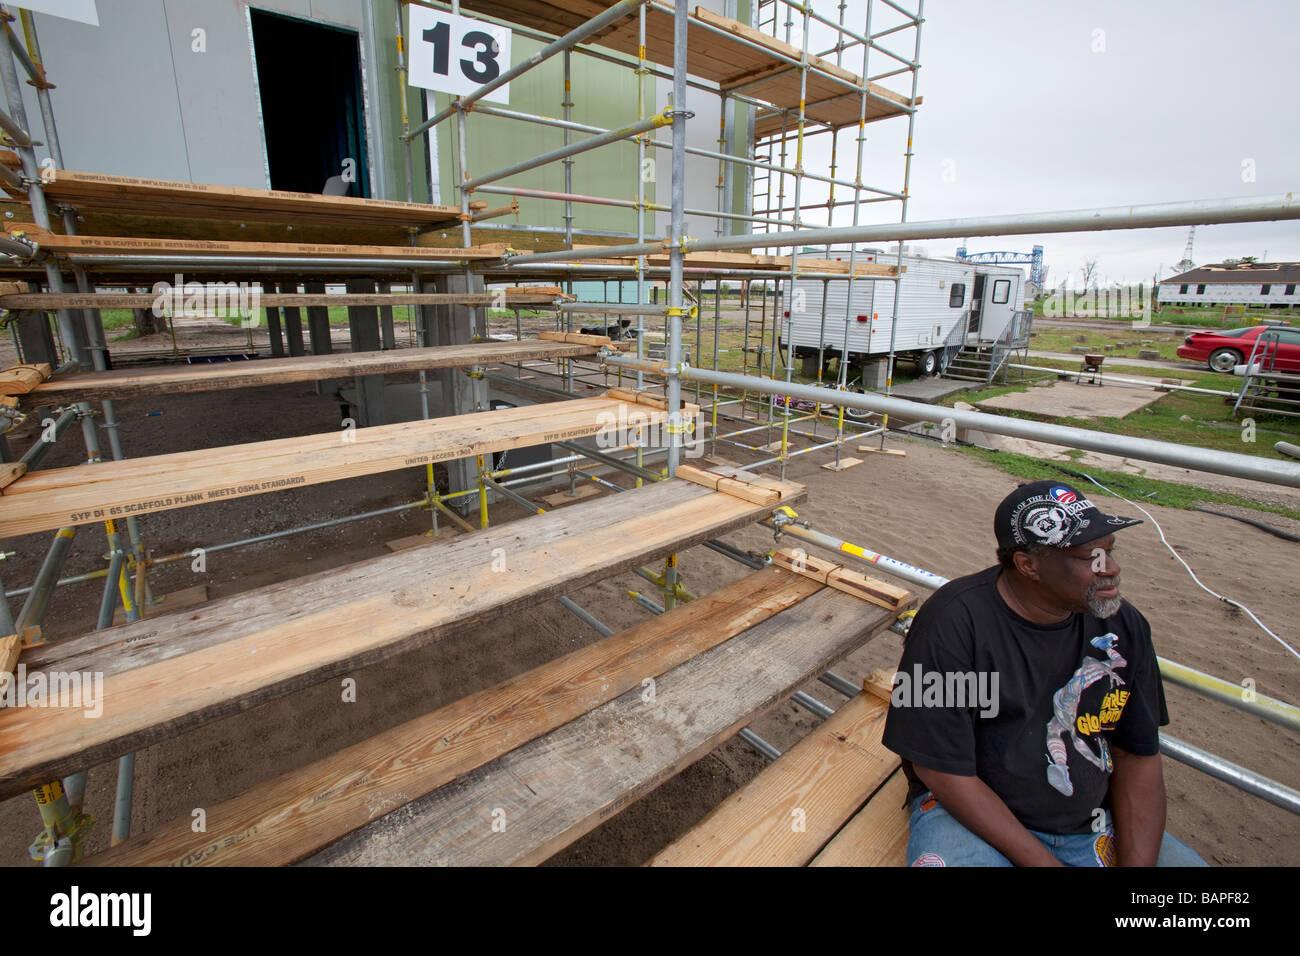 Hurricane Katrina Survivor in Lower Ninth Ward - Stock Image